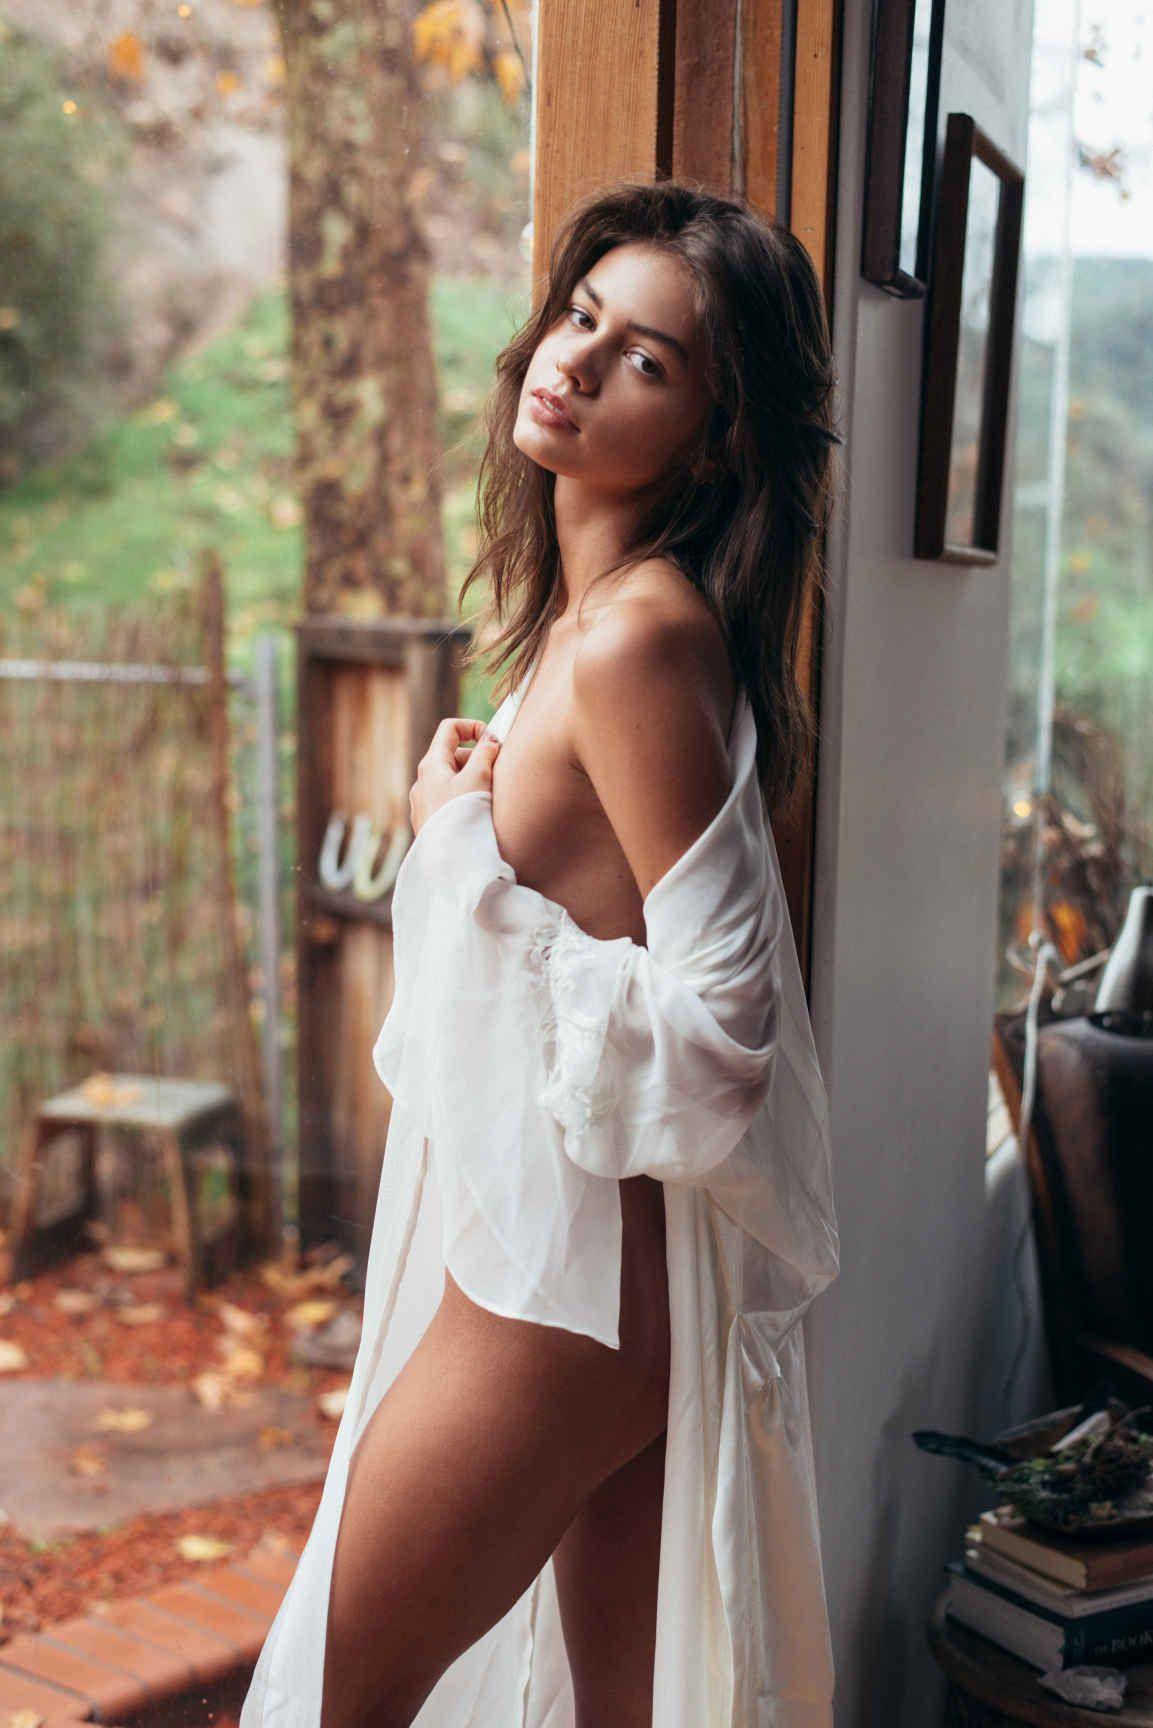 Selfie Beate Muska nude (83 foto and video), Pussy, Paparazzi, Instagram, cleavage 2006